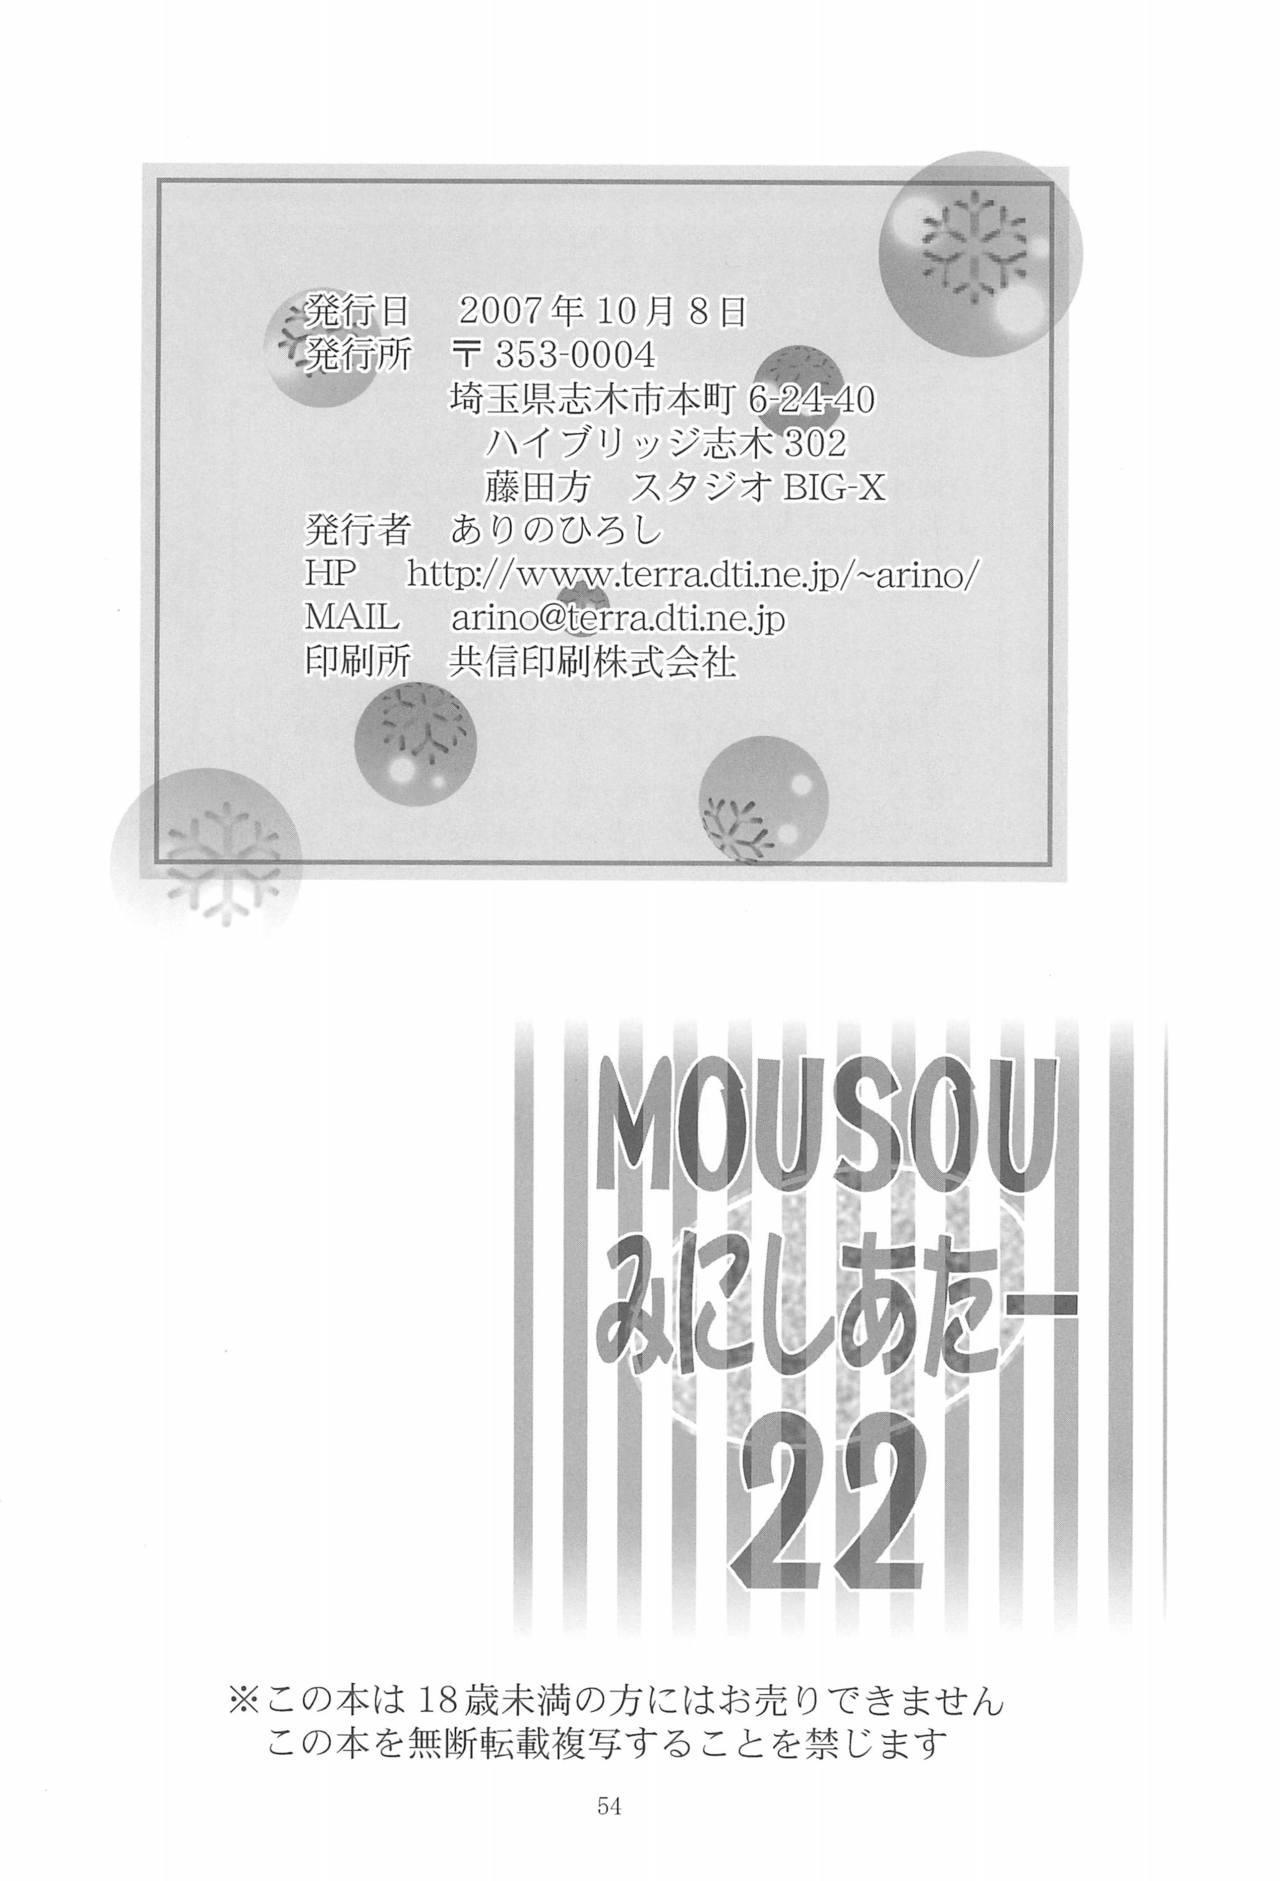 MOUSOU Mini Theater 22 53